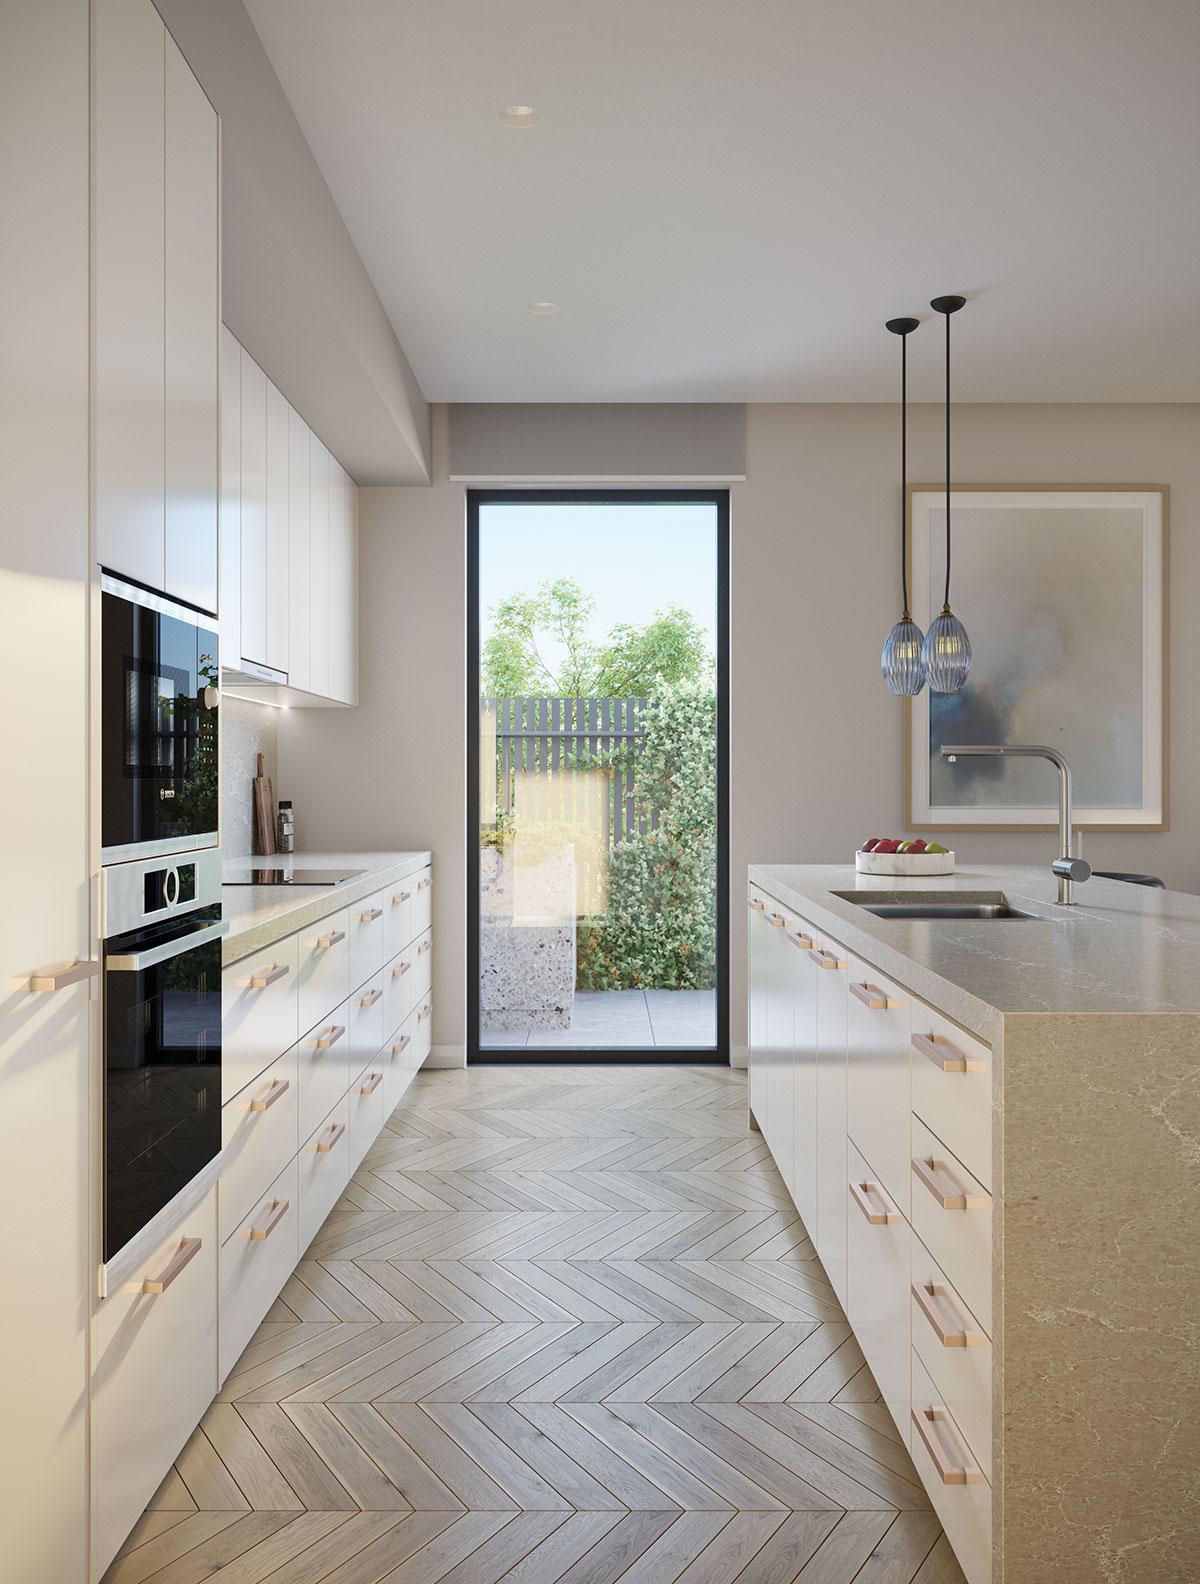 Baptcare, Strathalan (retirement living) - artist impression of Orchards apartments - artist impression of kitchen light colour scheme